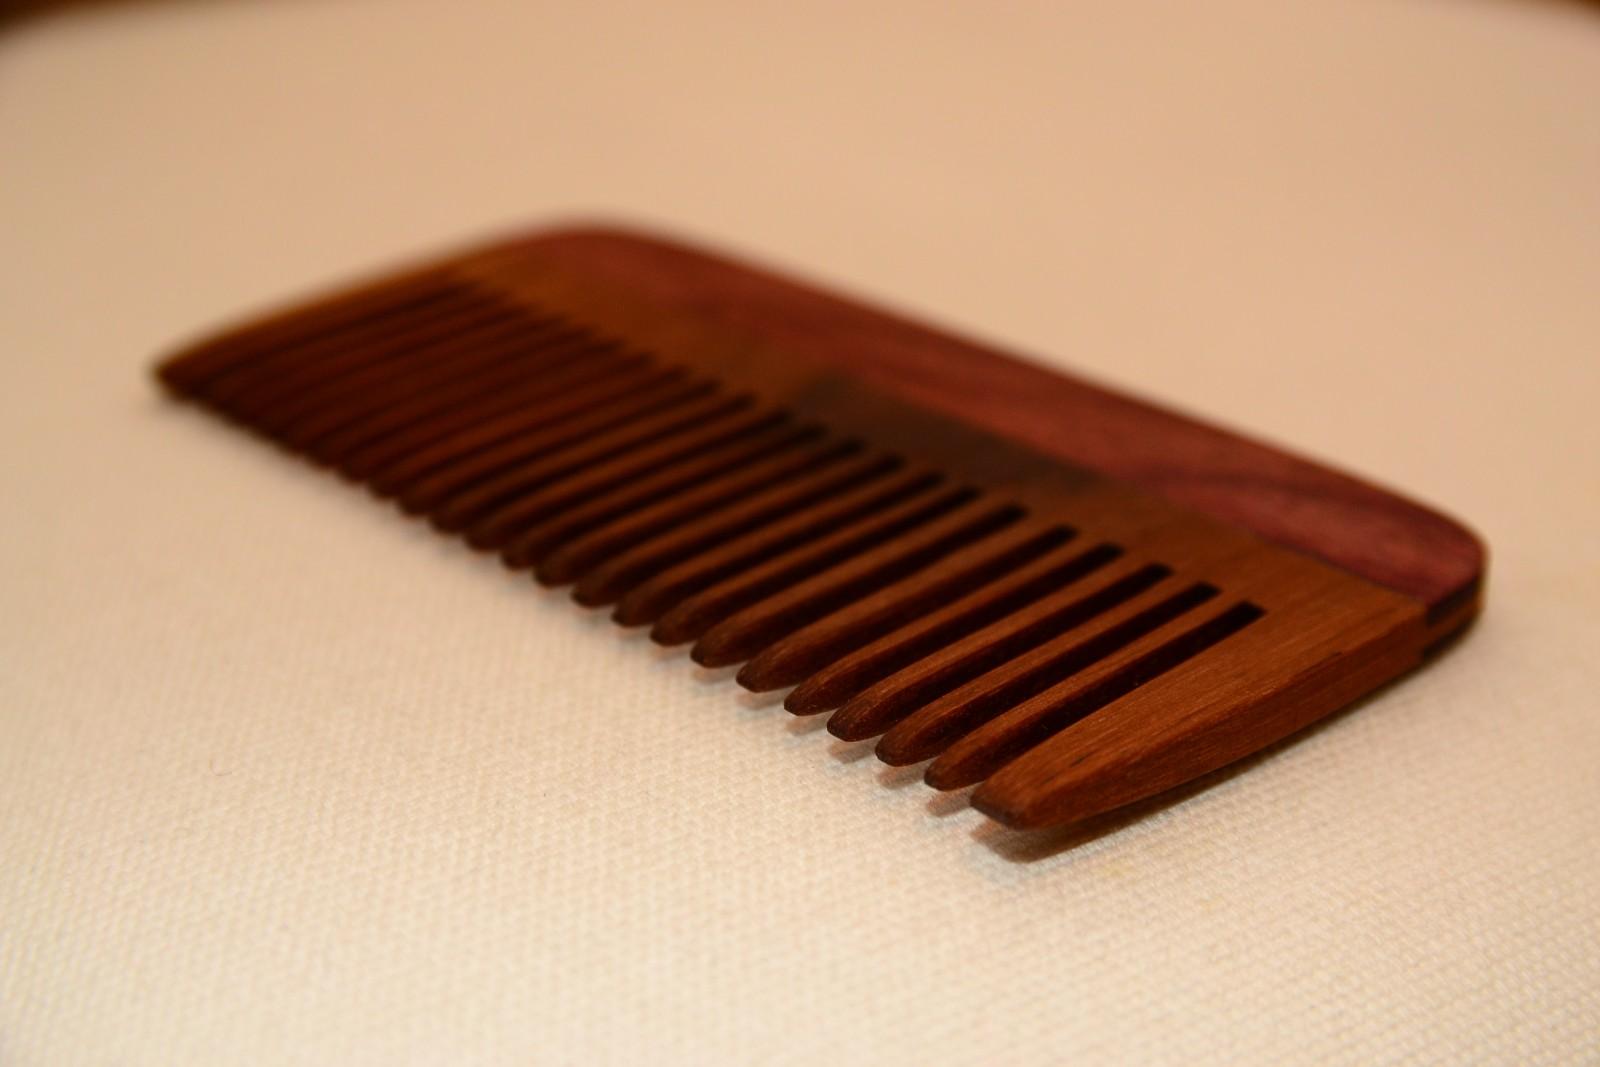 Hardwood comb